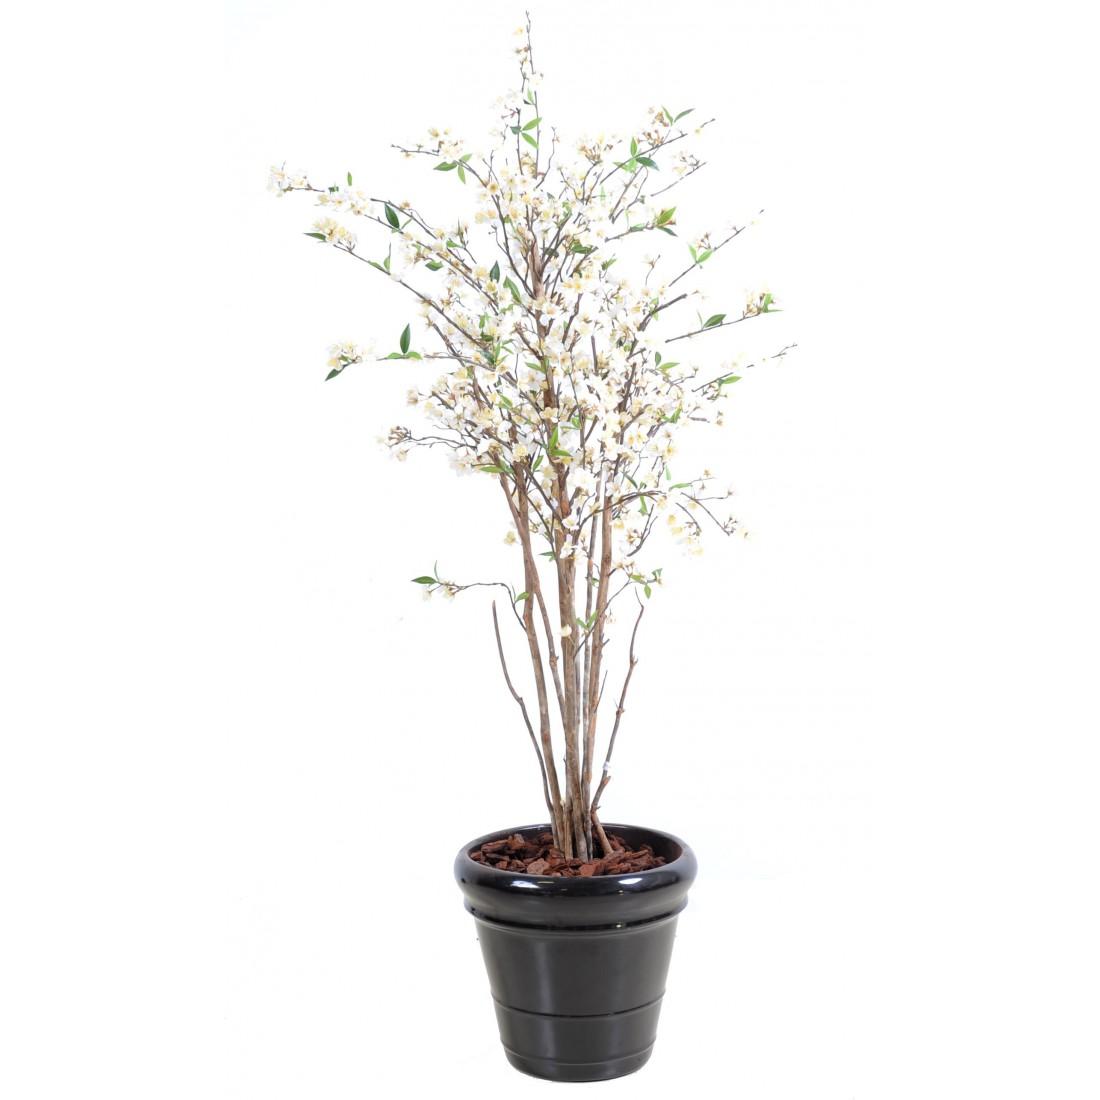 cerisier artificiel new en fleur 150 cm arbres fleuris reflets nature lyon. Black Bedroom Furniture Sets. Home Design Ideas